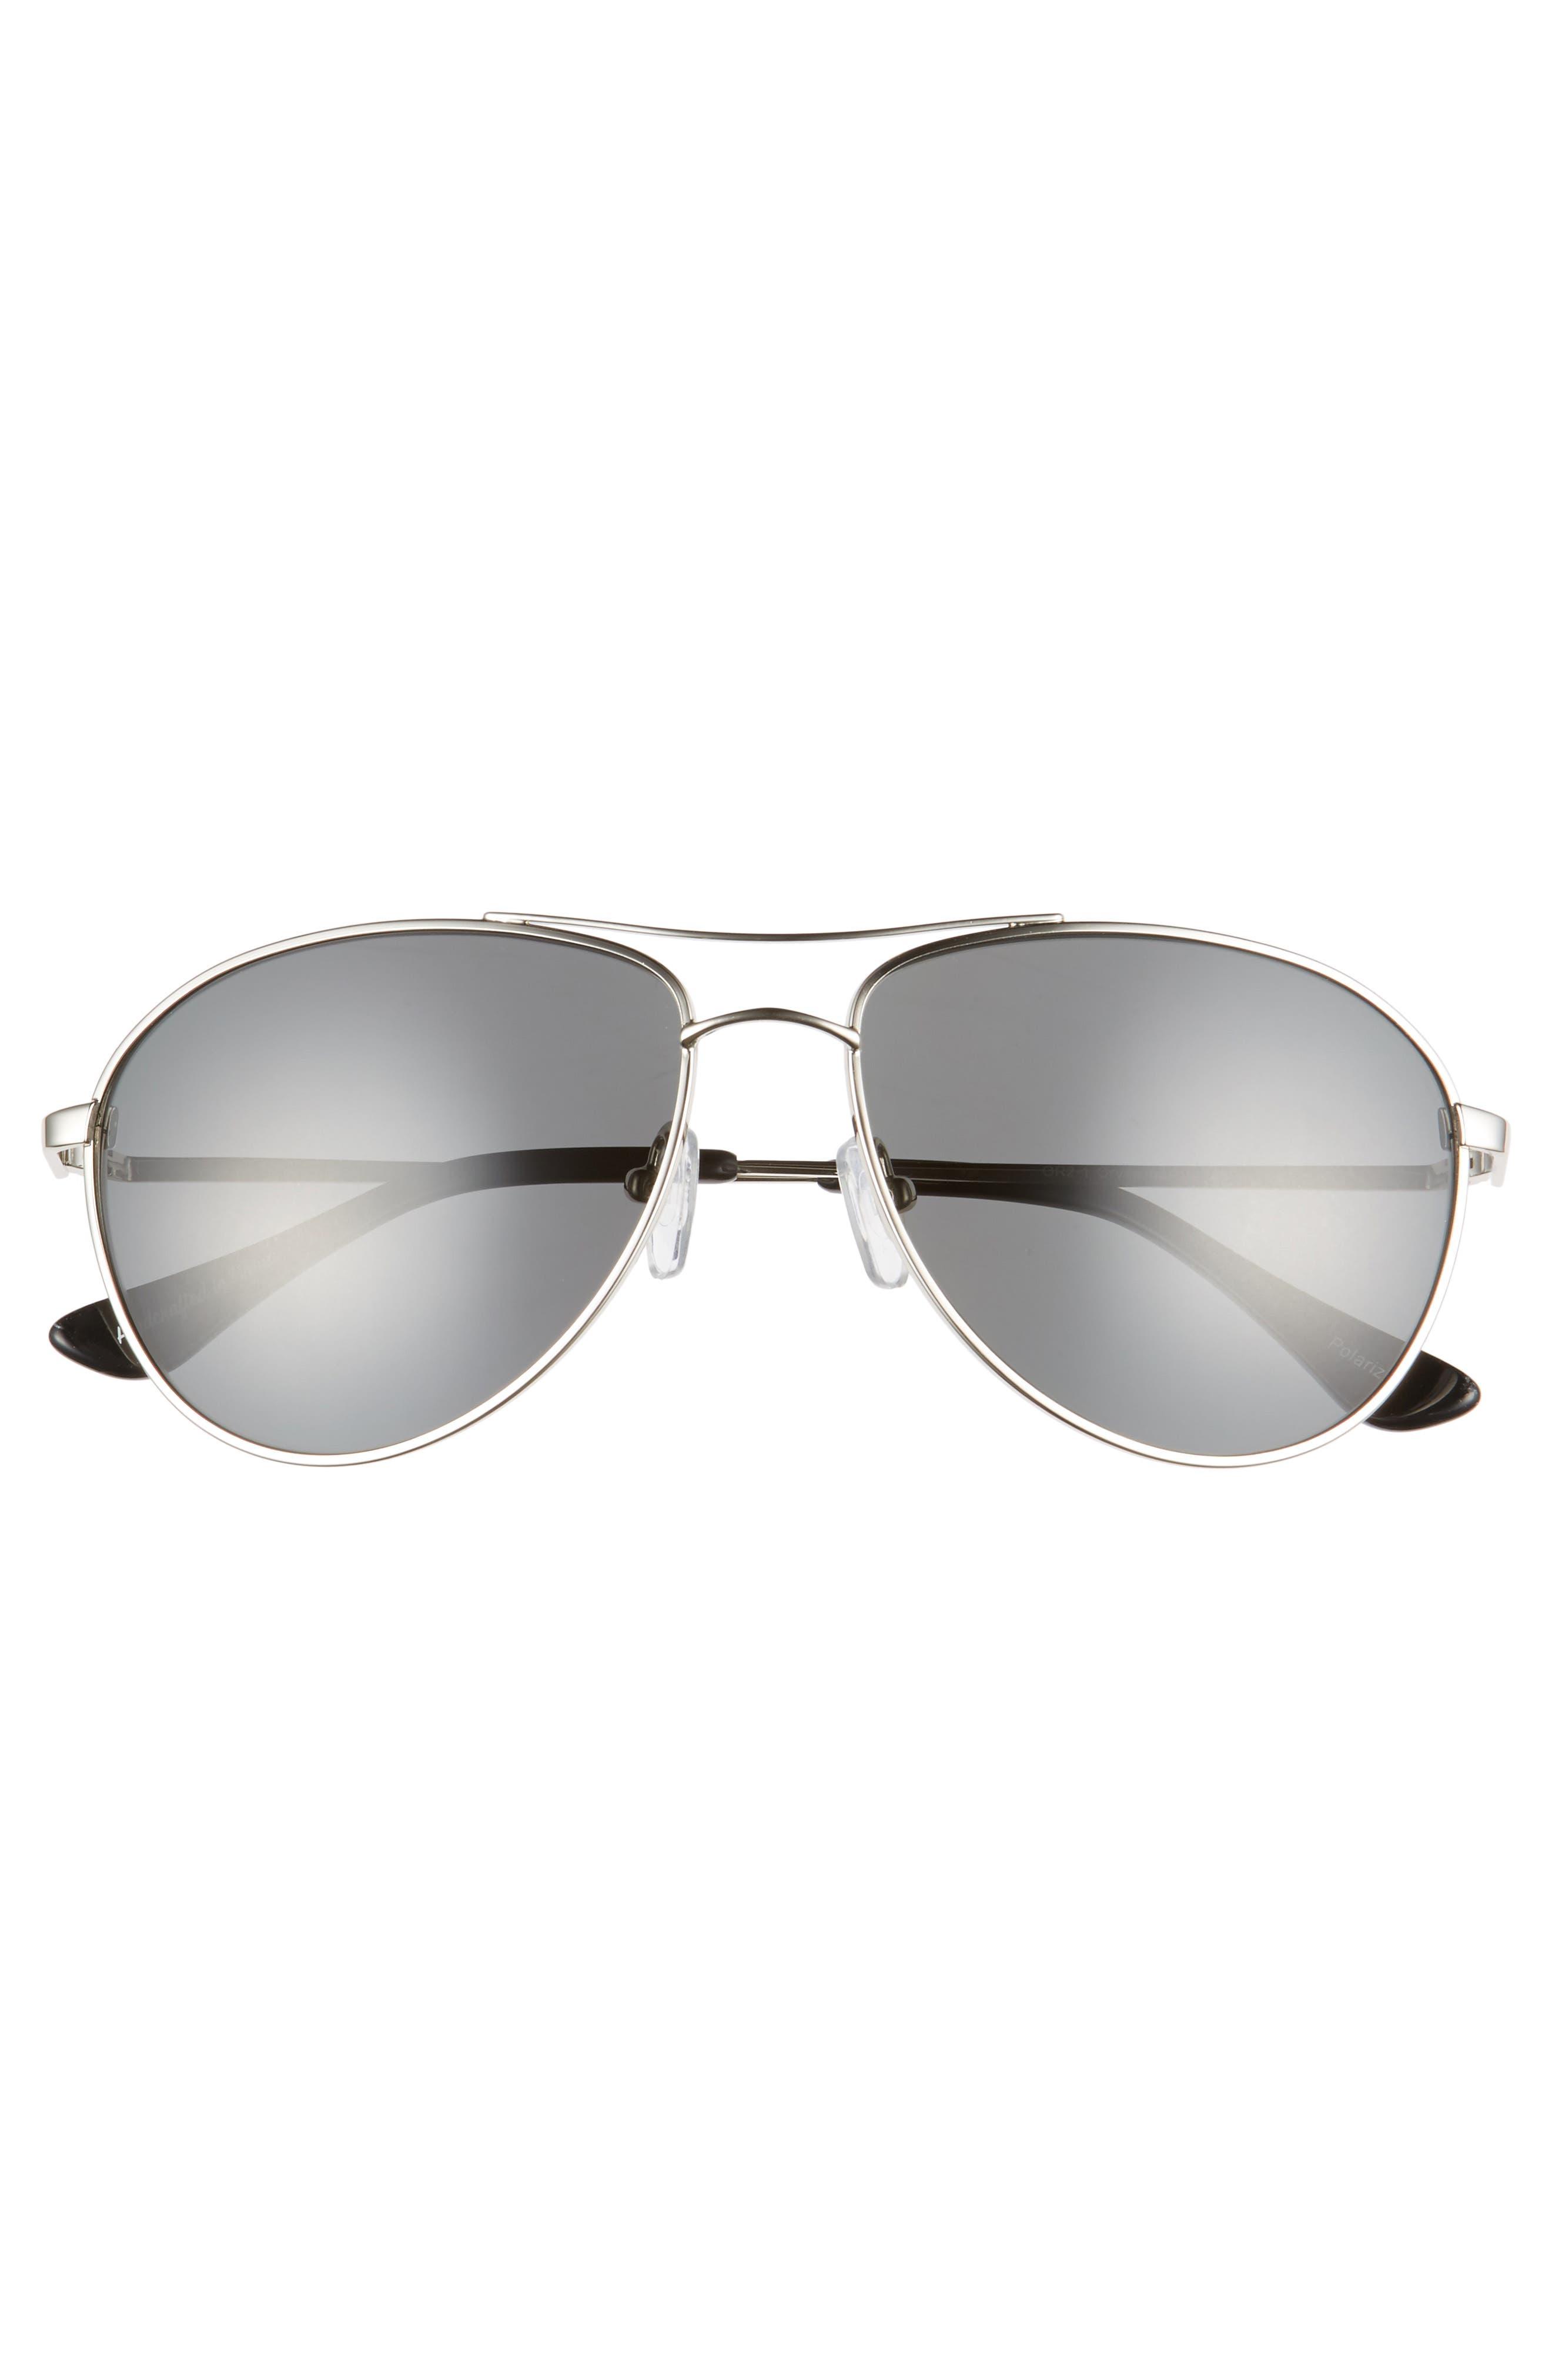 Orville 58mm Polarized Aviator Sunglasses,                             Alternate thumbnail 5, color,